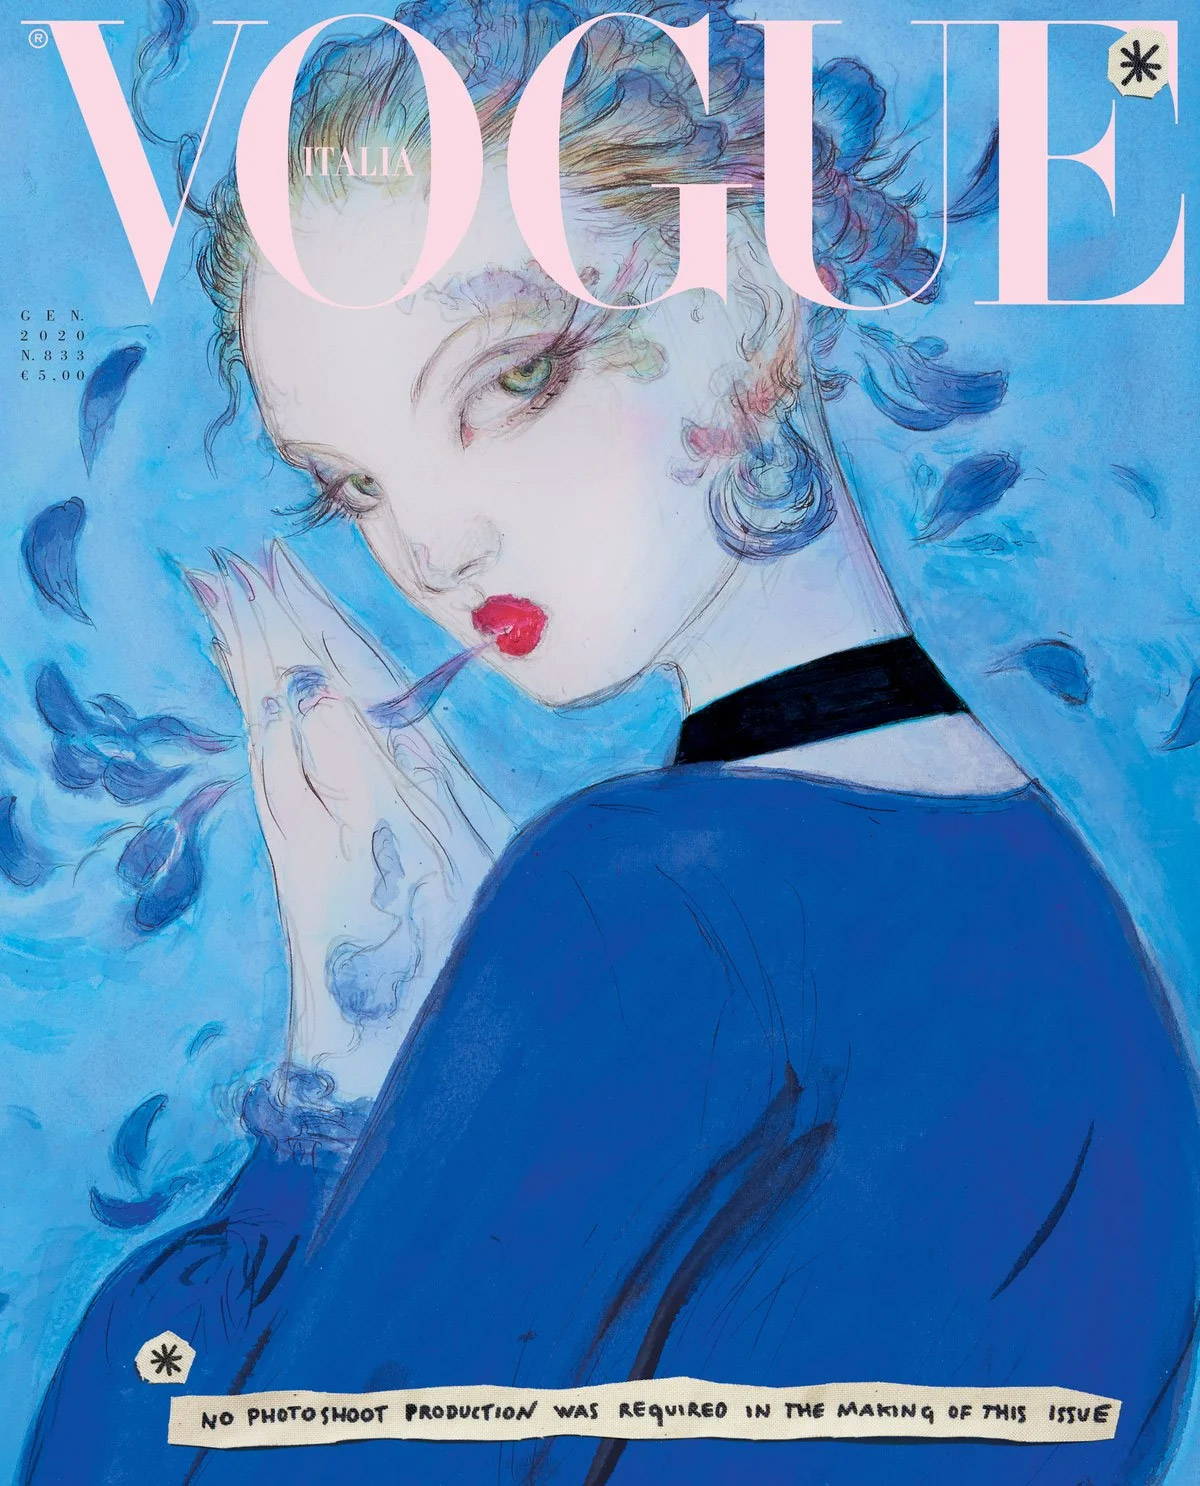 LE GRAND FOURRE-TOUT - Page 22 Yoshitaka-Amano-Vogue-cover-full-size-noscale